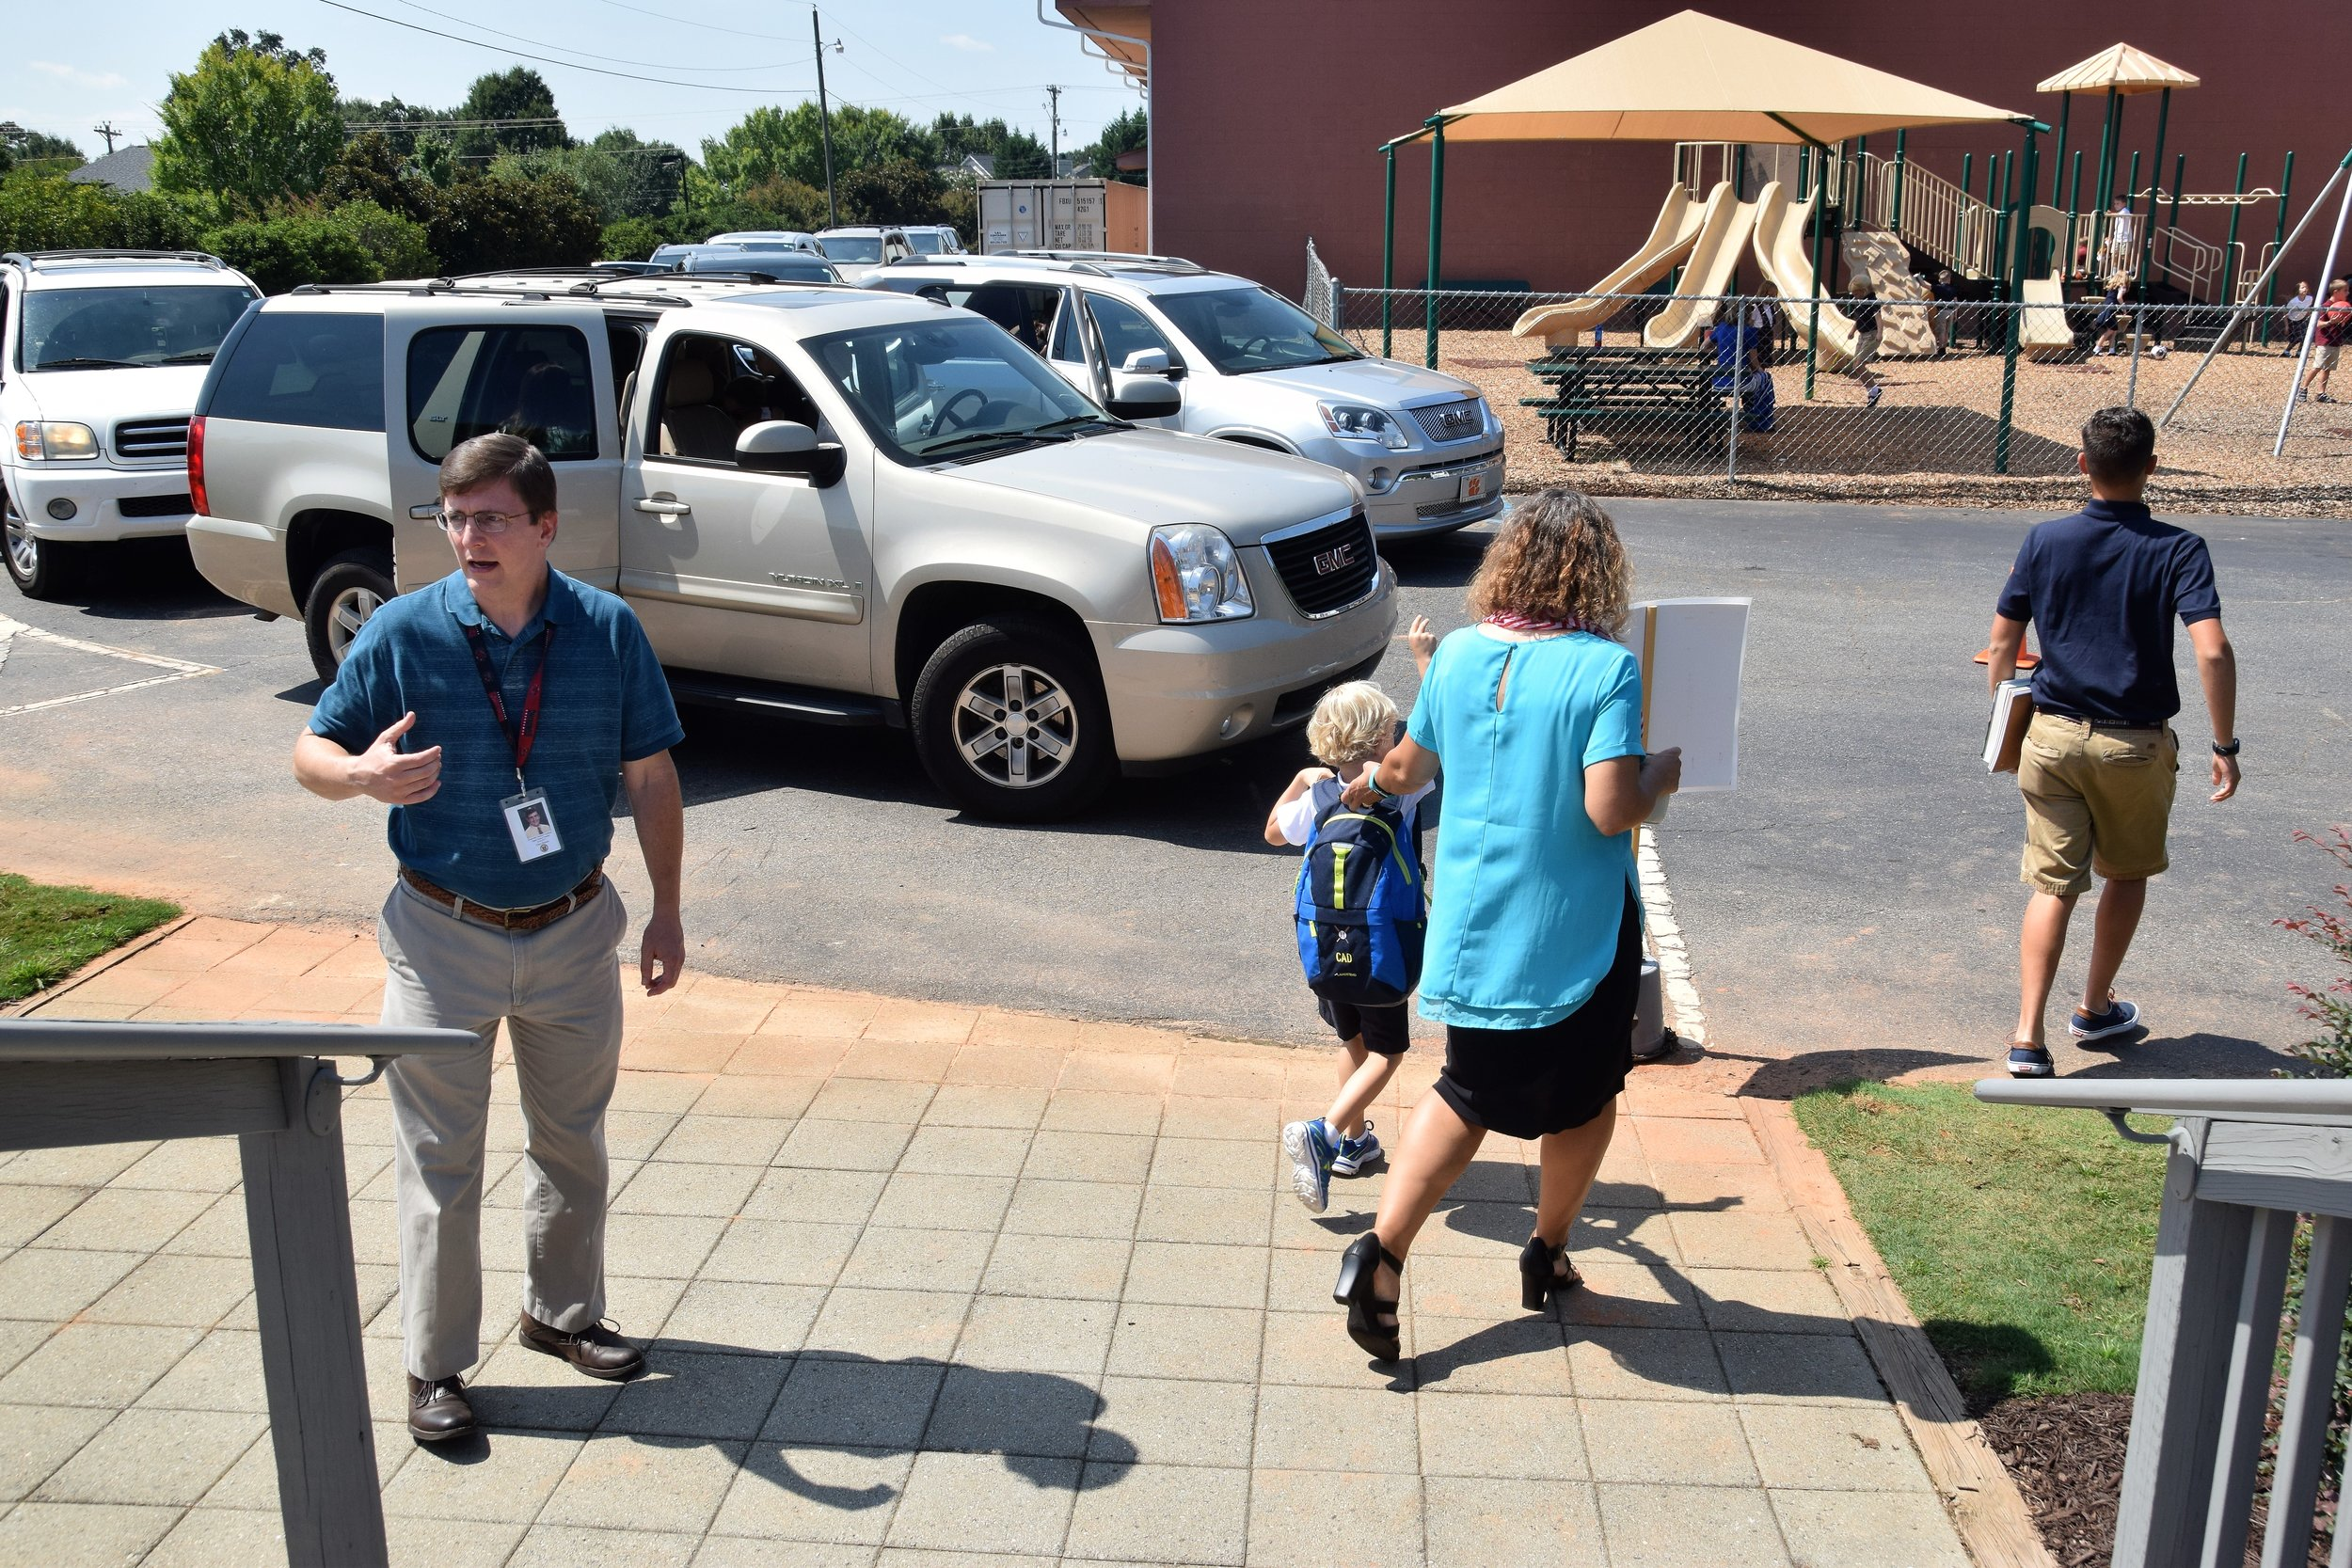 Lower School 1st Day of School 8-23-17 (39).JPG